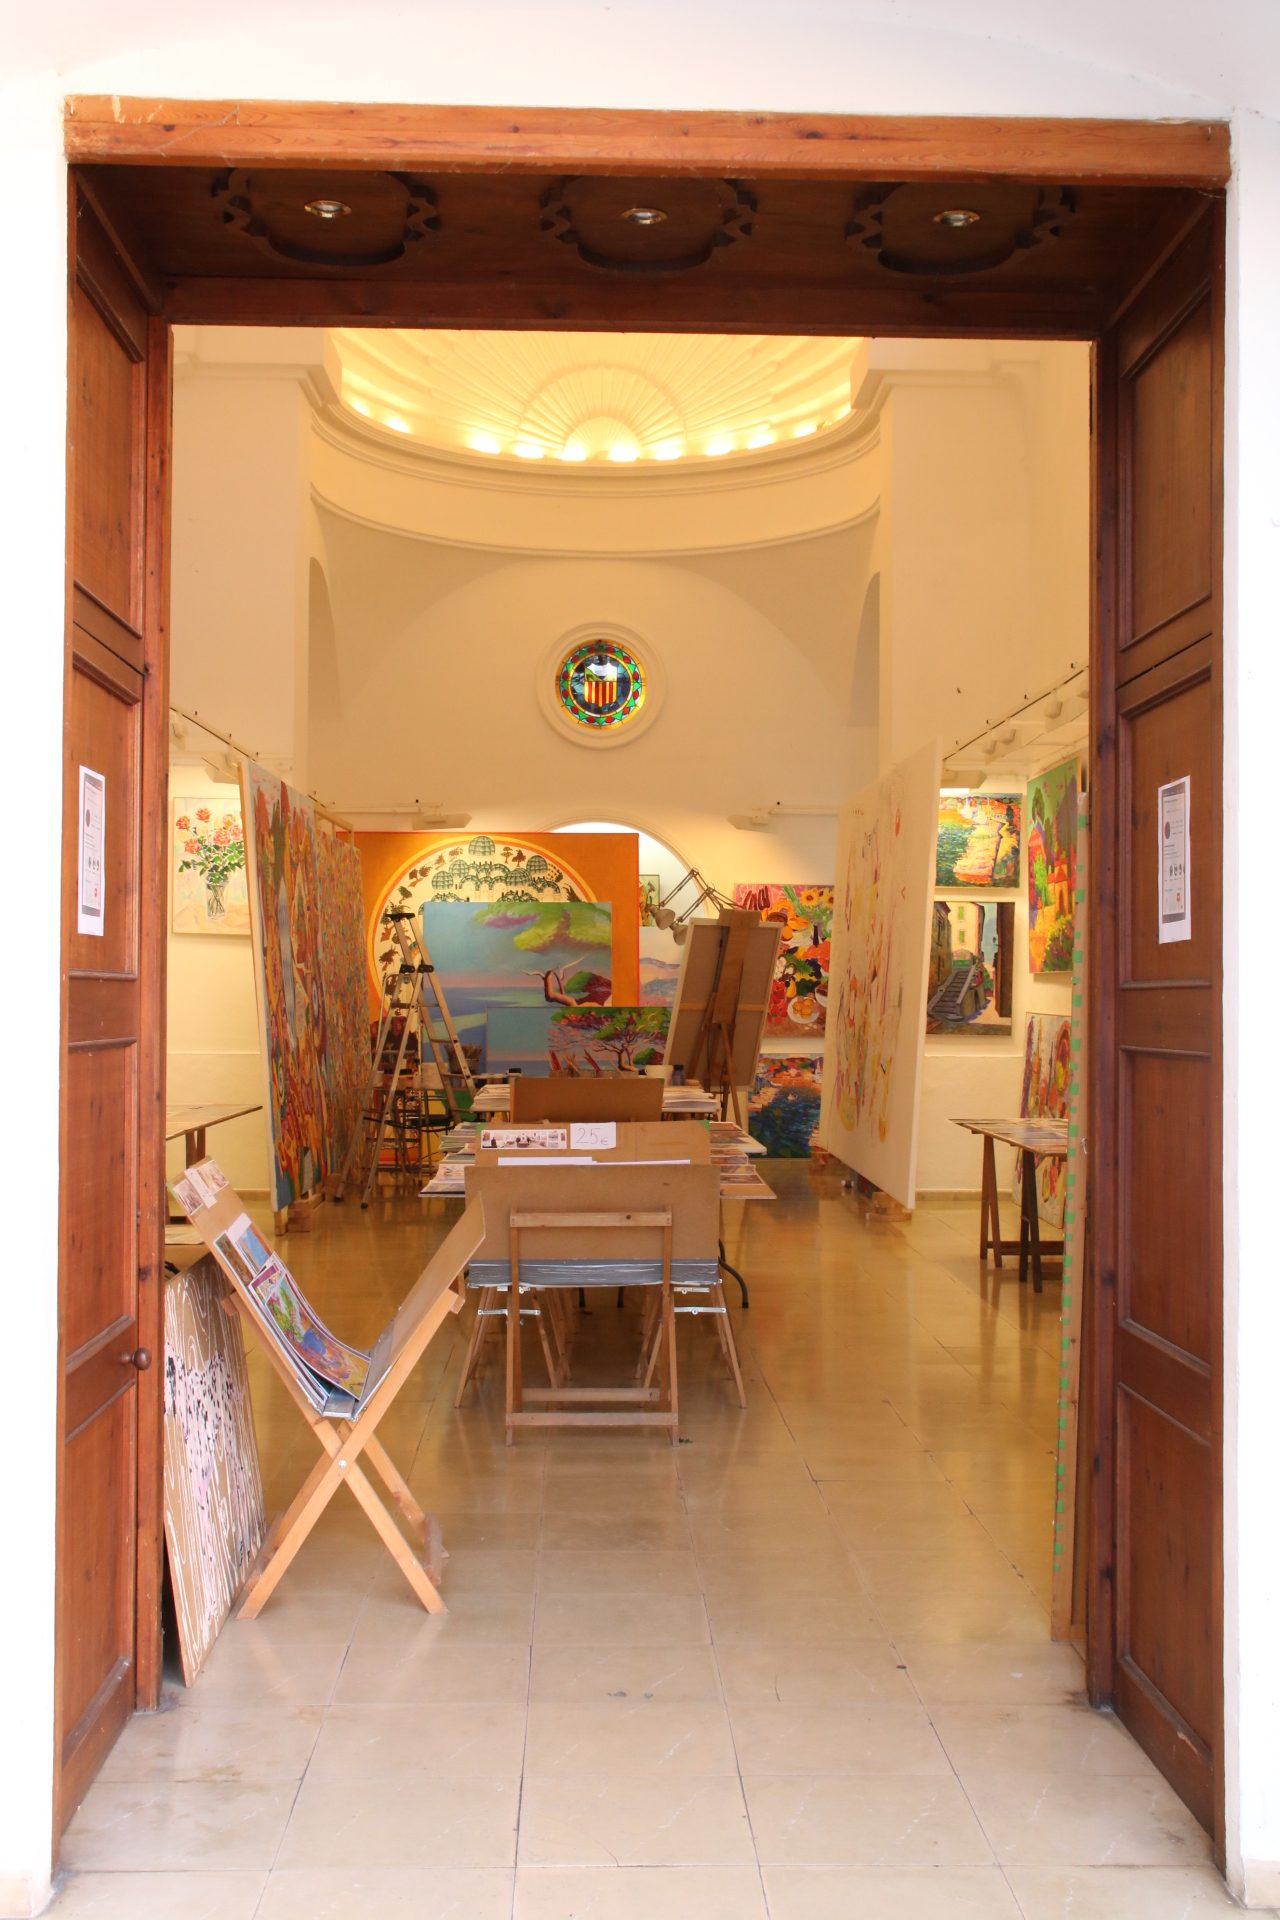 Atelier in Valldemossa